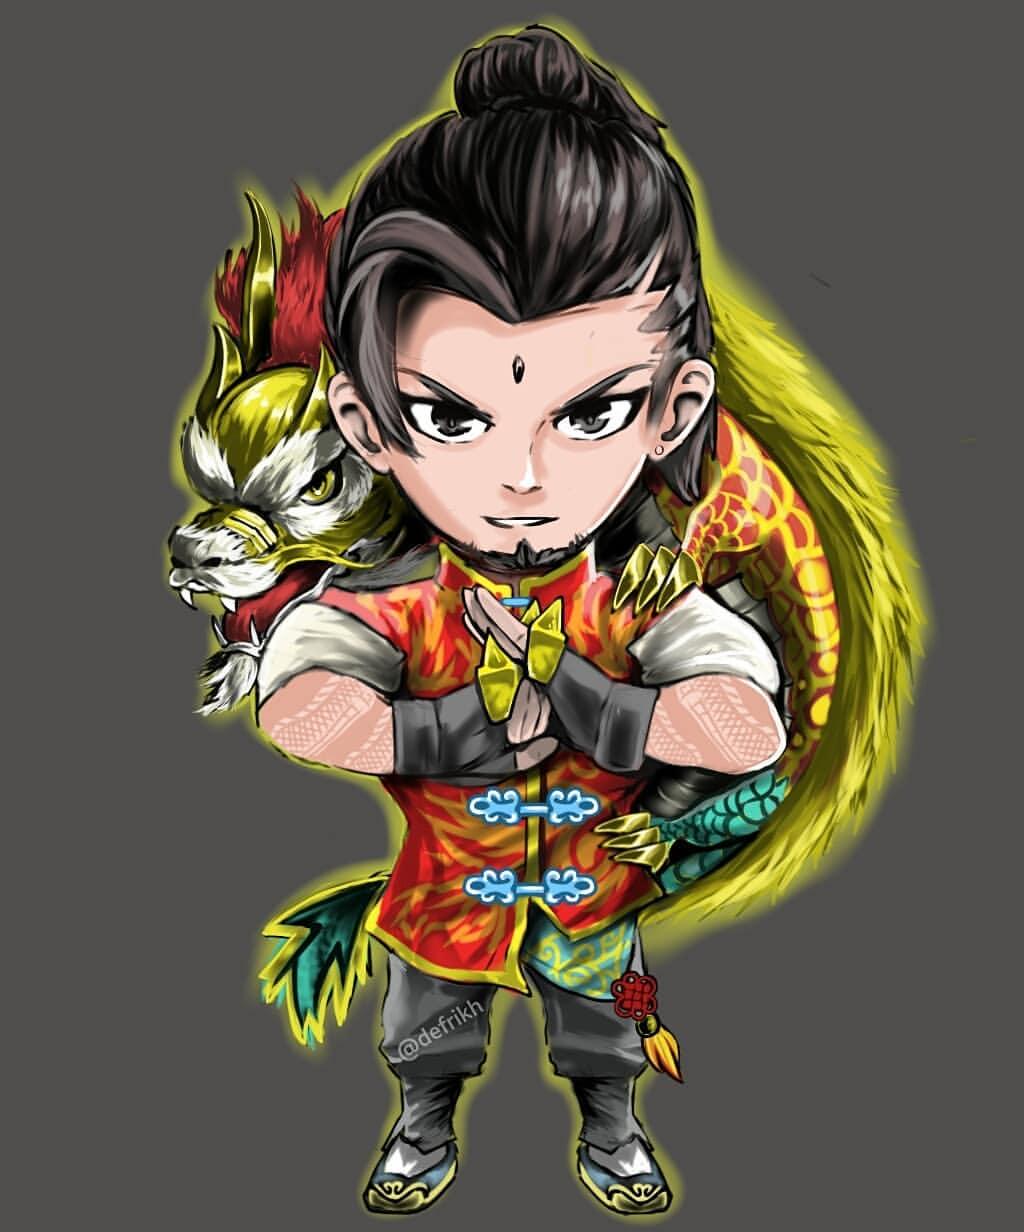 7400 Gambar Hero Ml Mini Terbaru